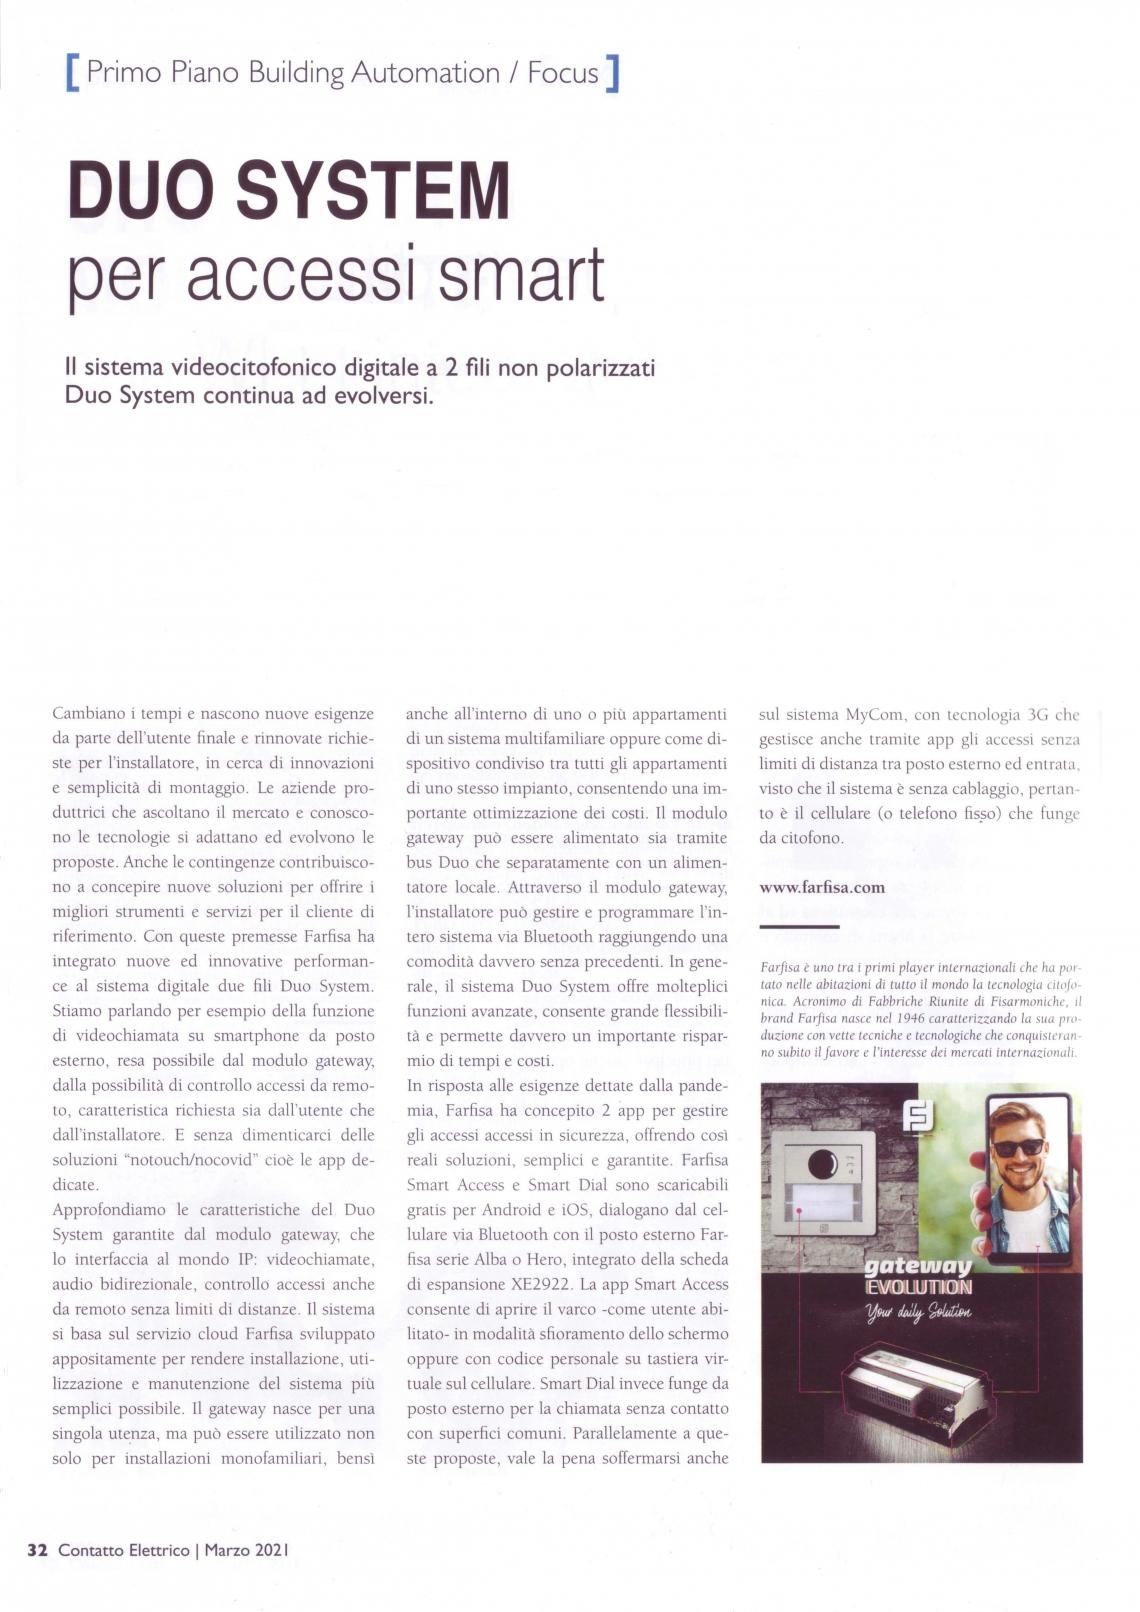 Duo System per accessi smart